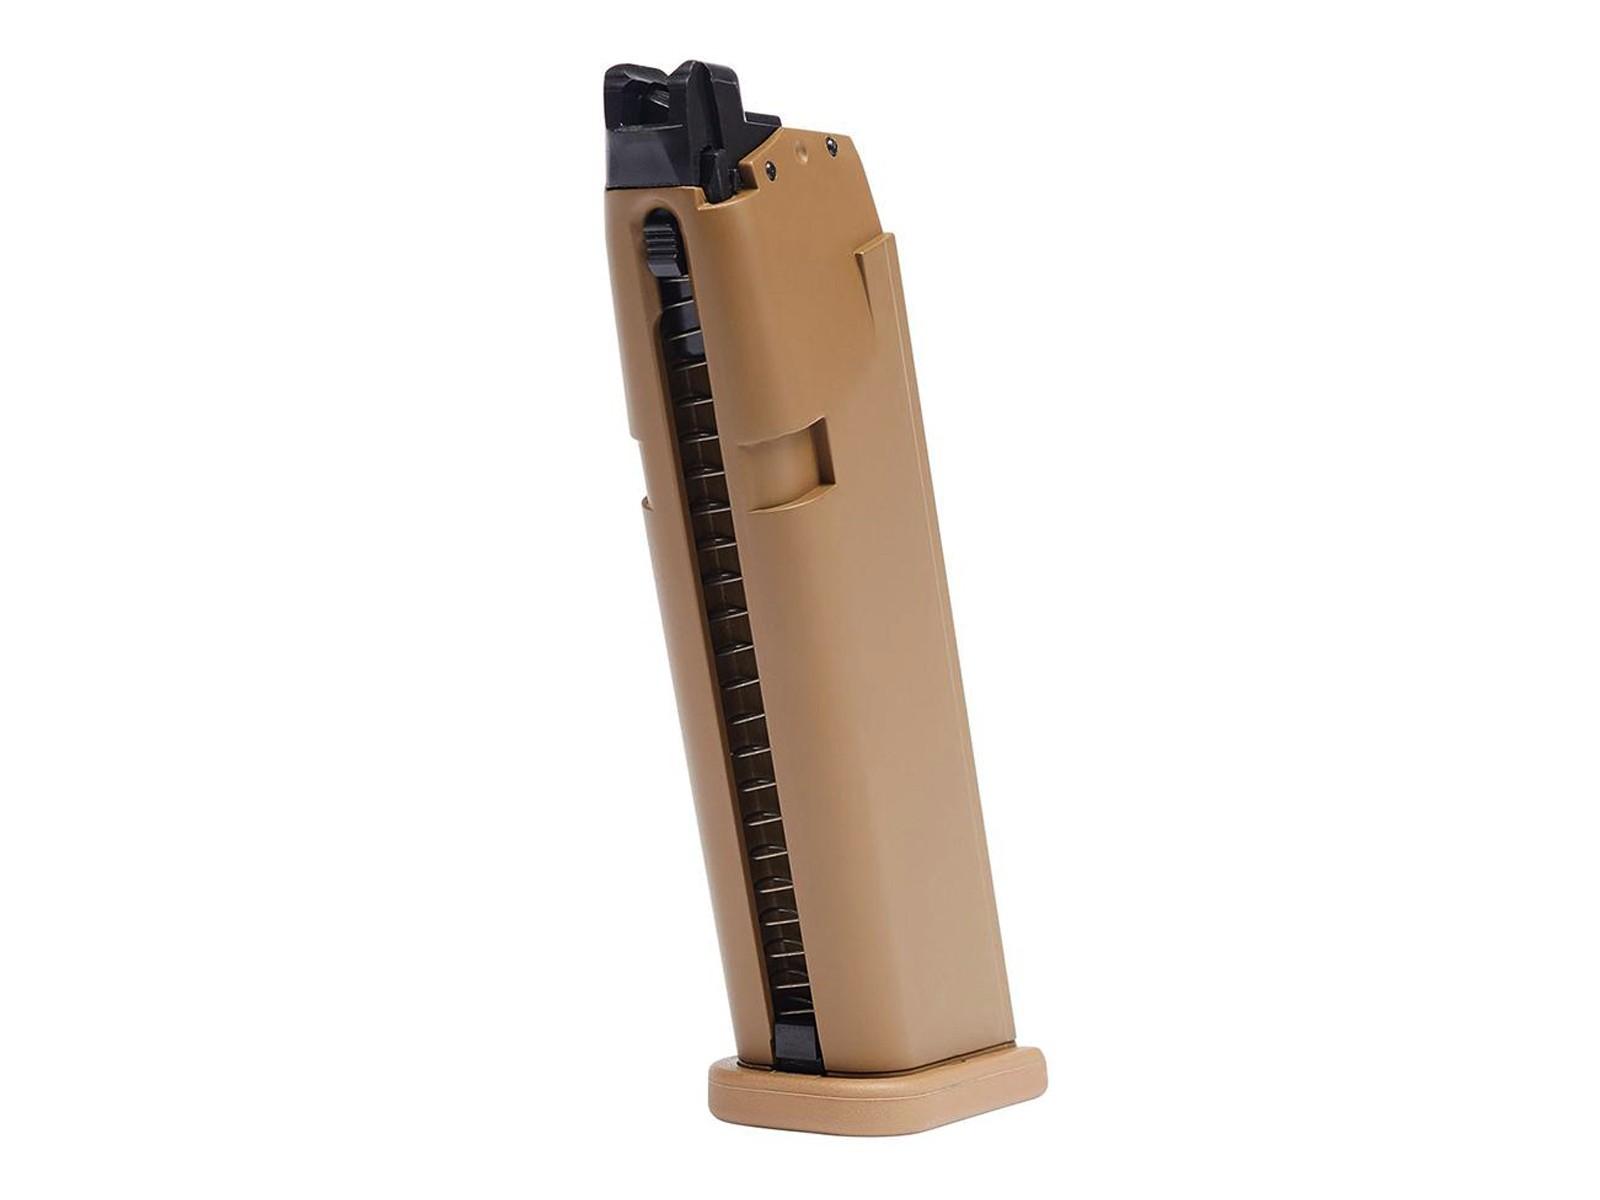 Glock G19X Airsoft GBB 20rd Pistols Magazine, Tan